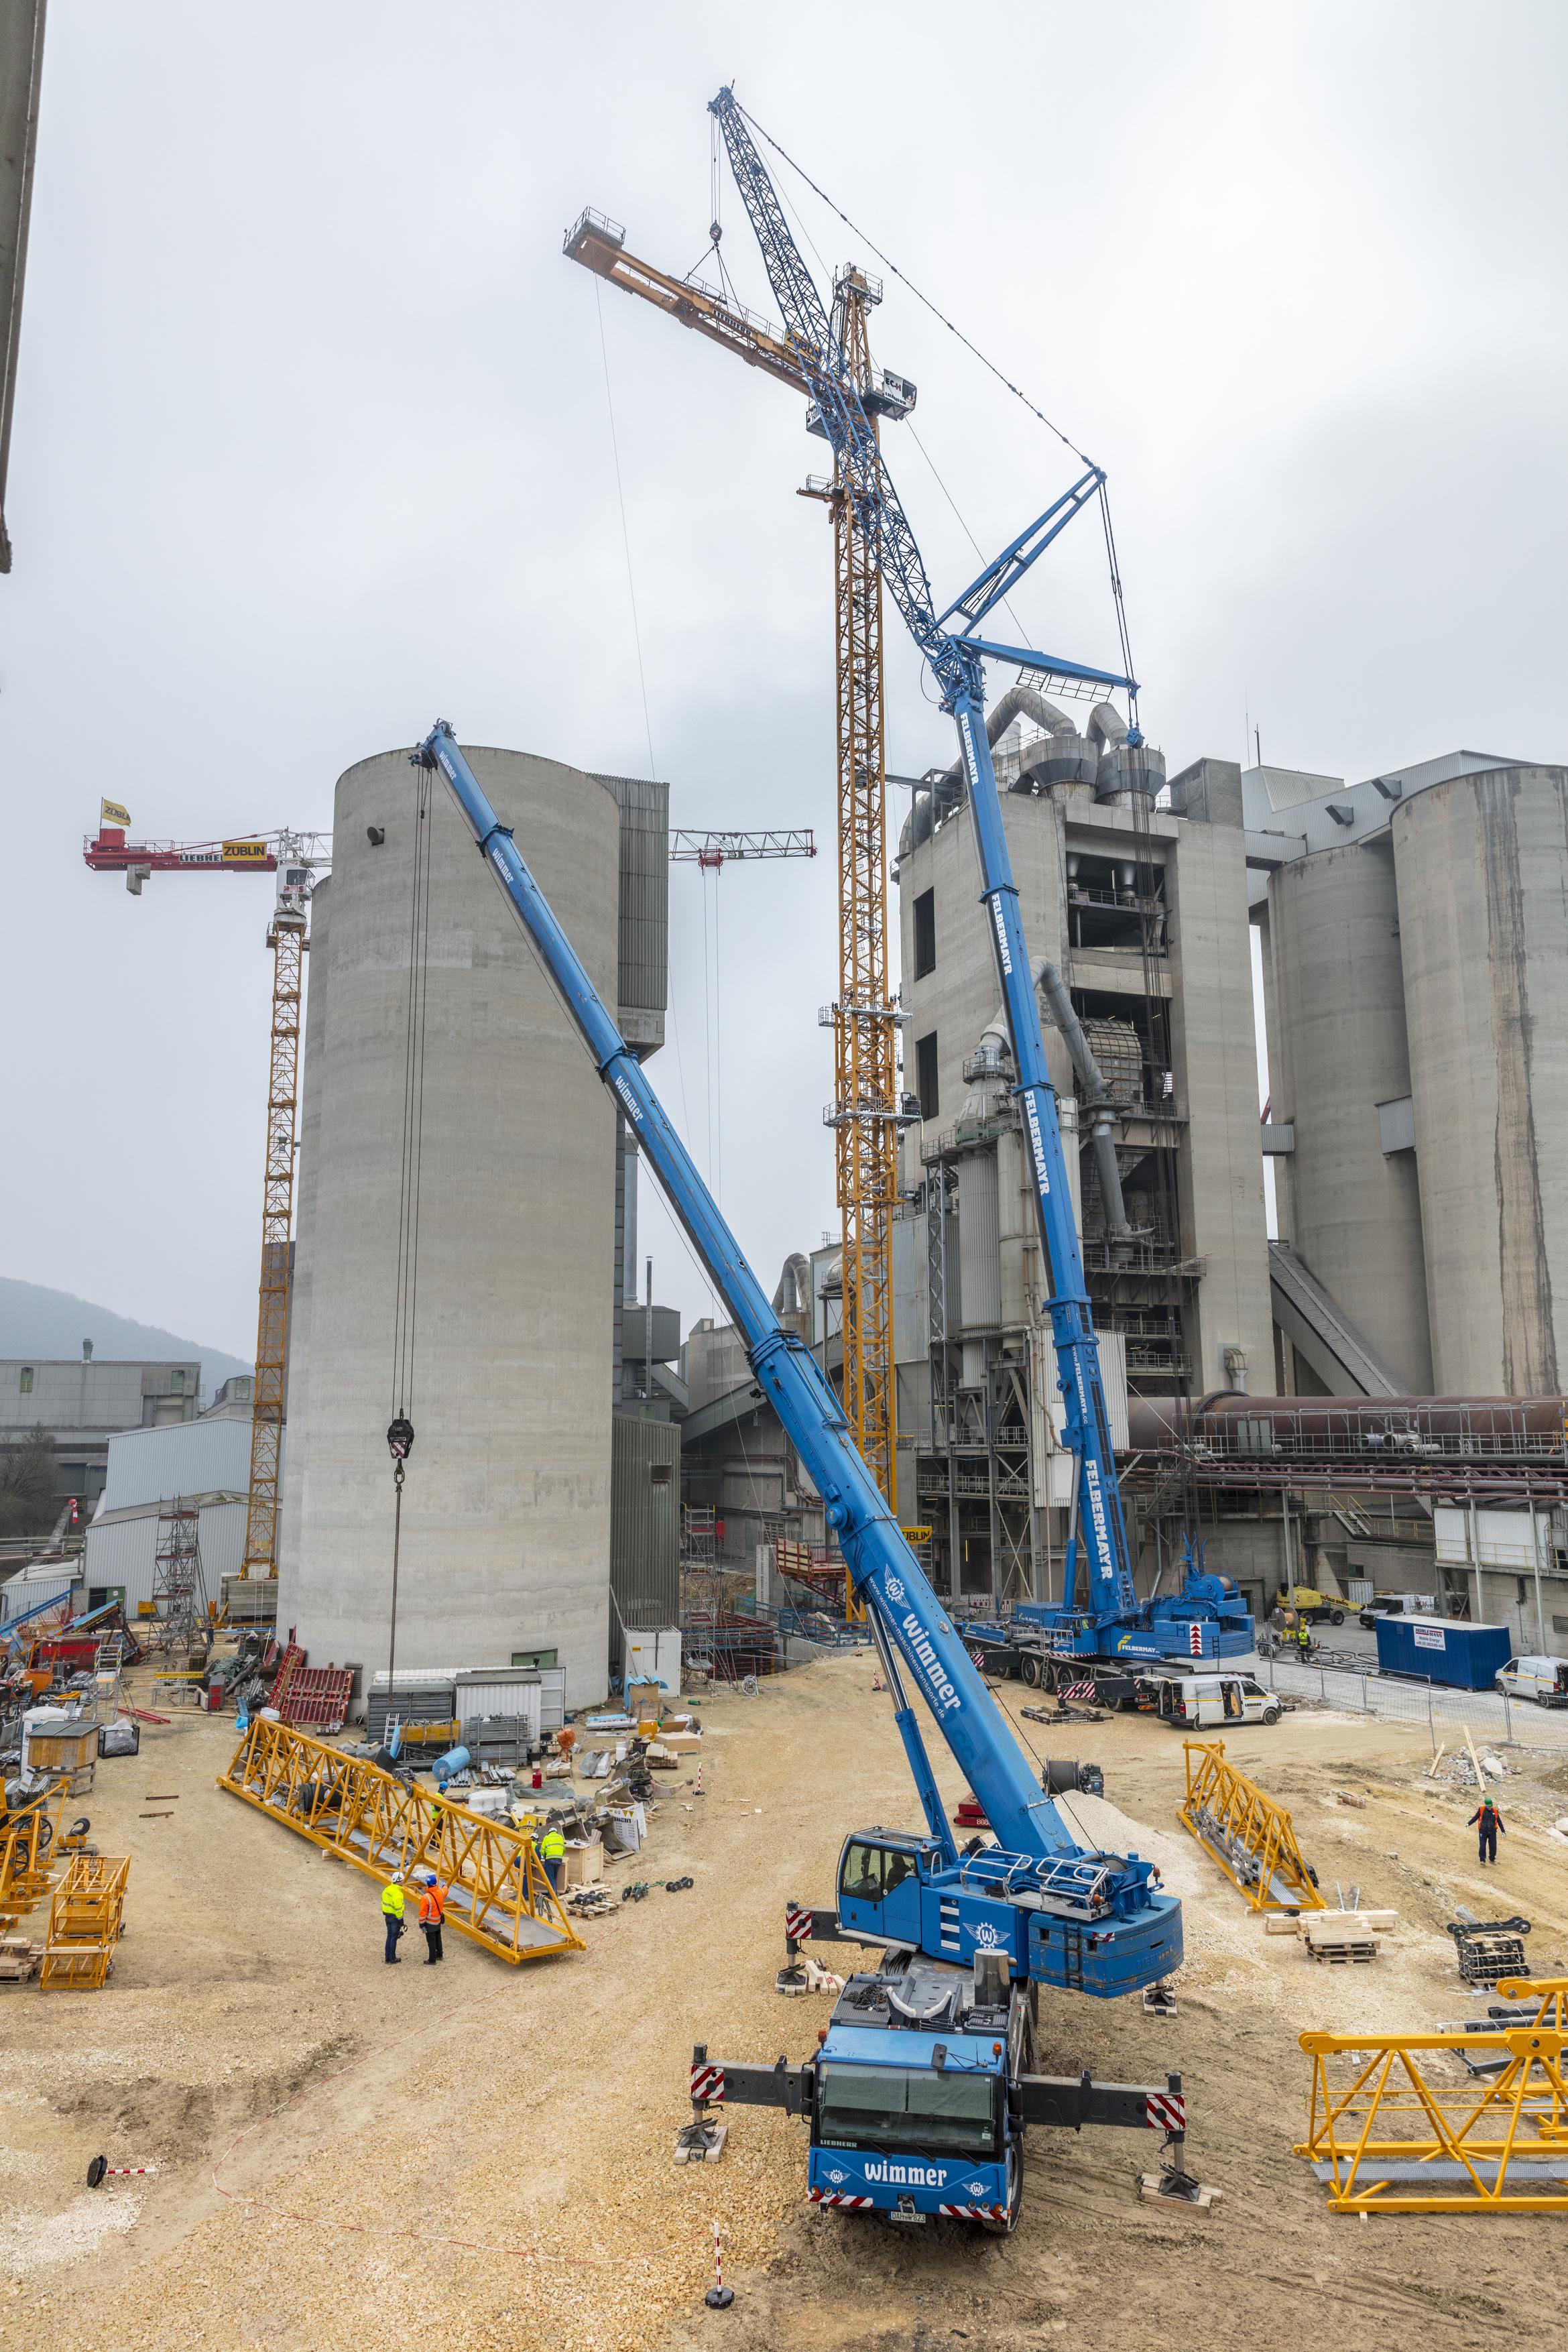 Two Liebherr mobile cranes assemble a Liebherr 1000 EC-H 50 Litronic tower crane.